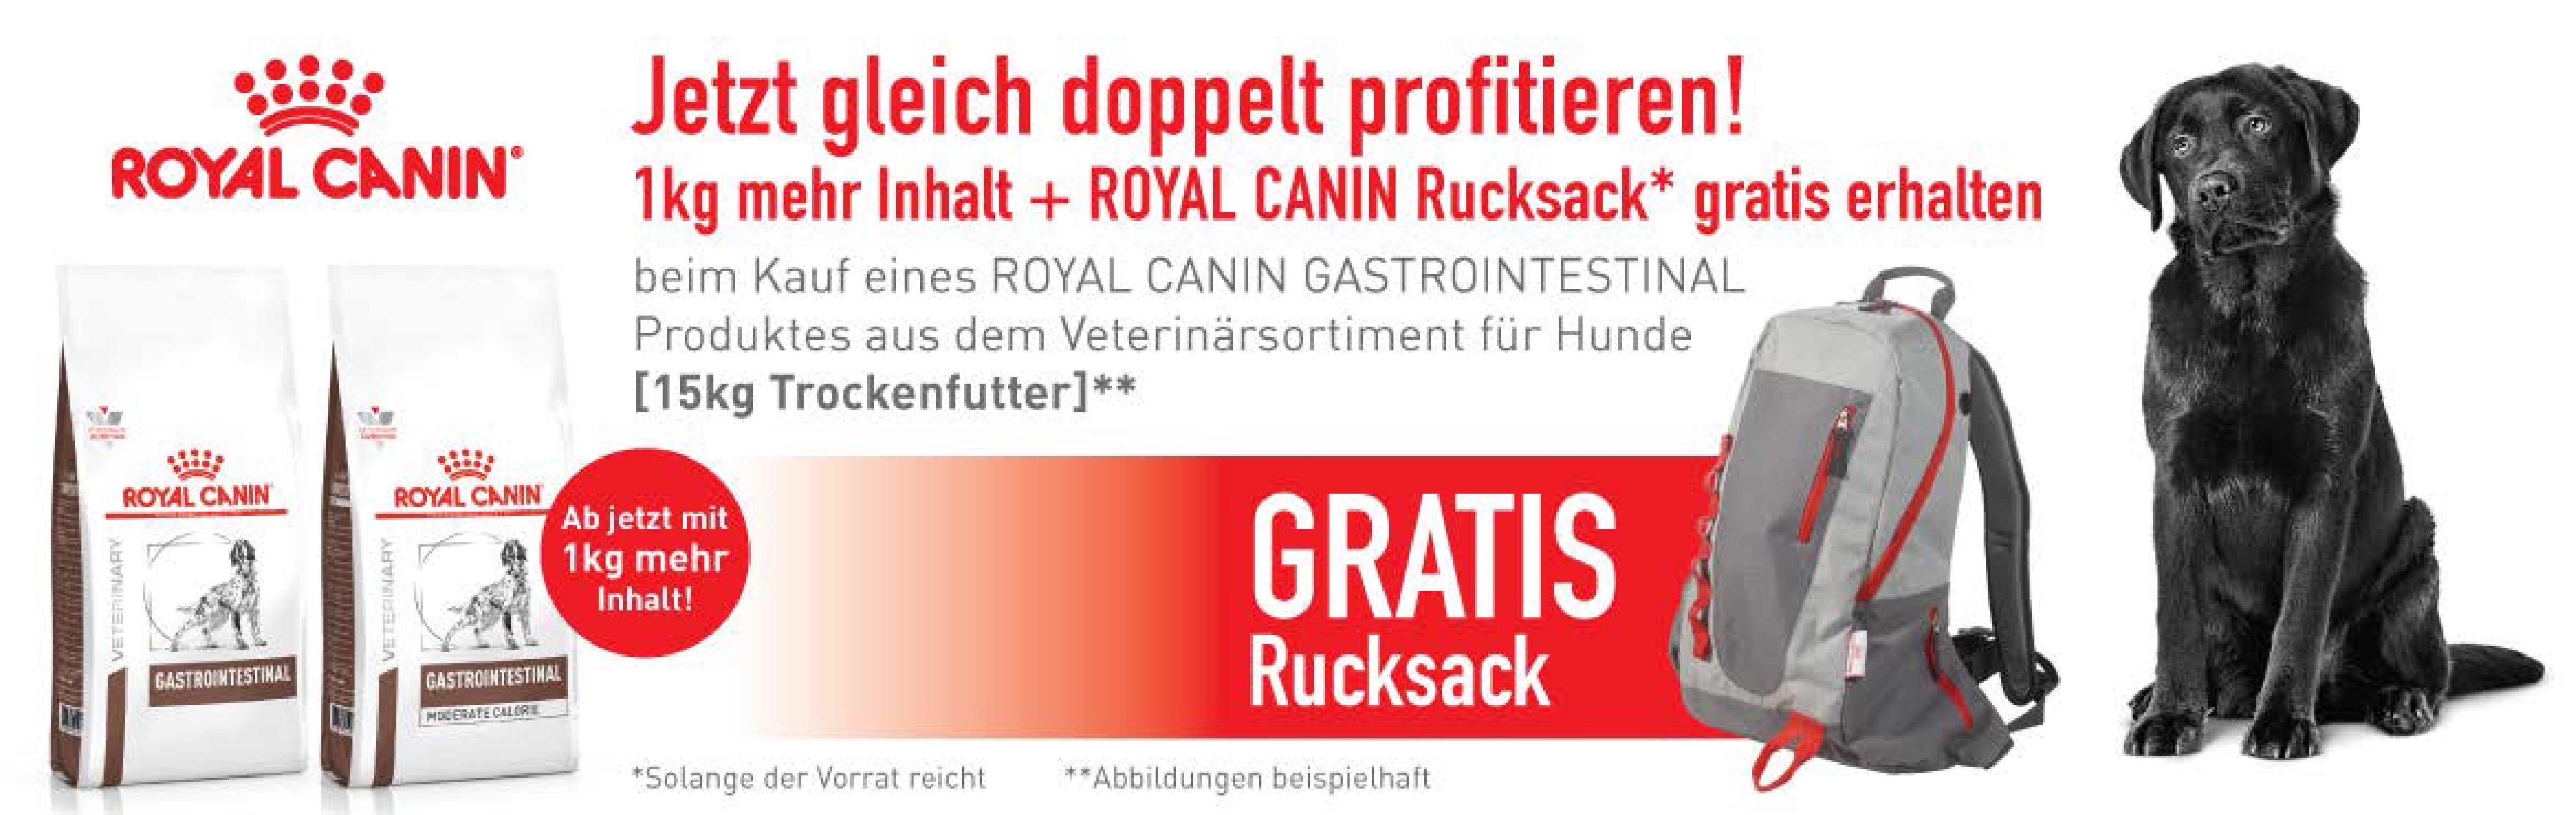 Banner 96 - RC Rucksack